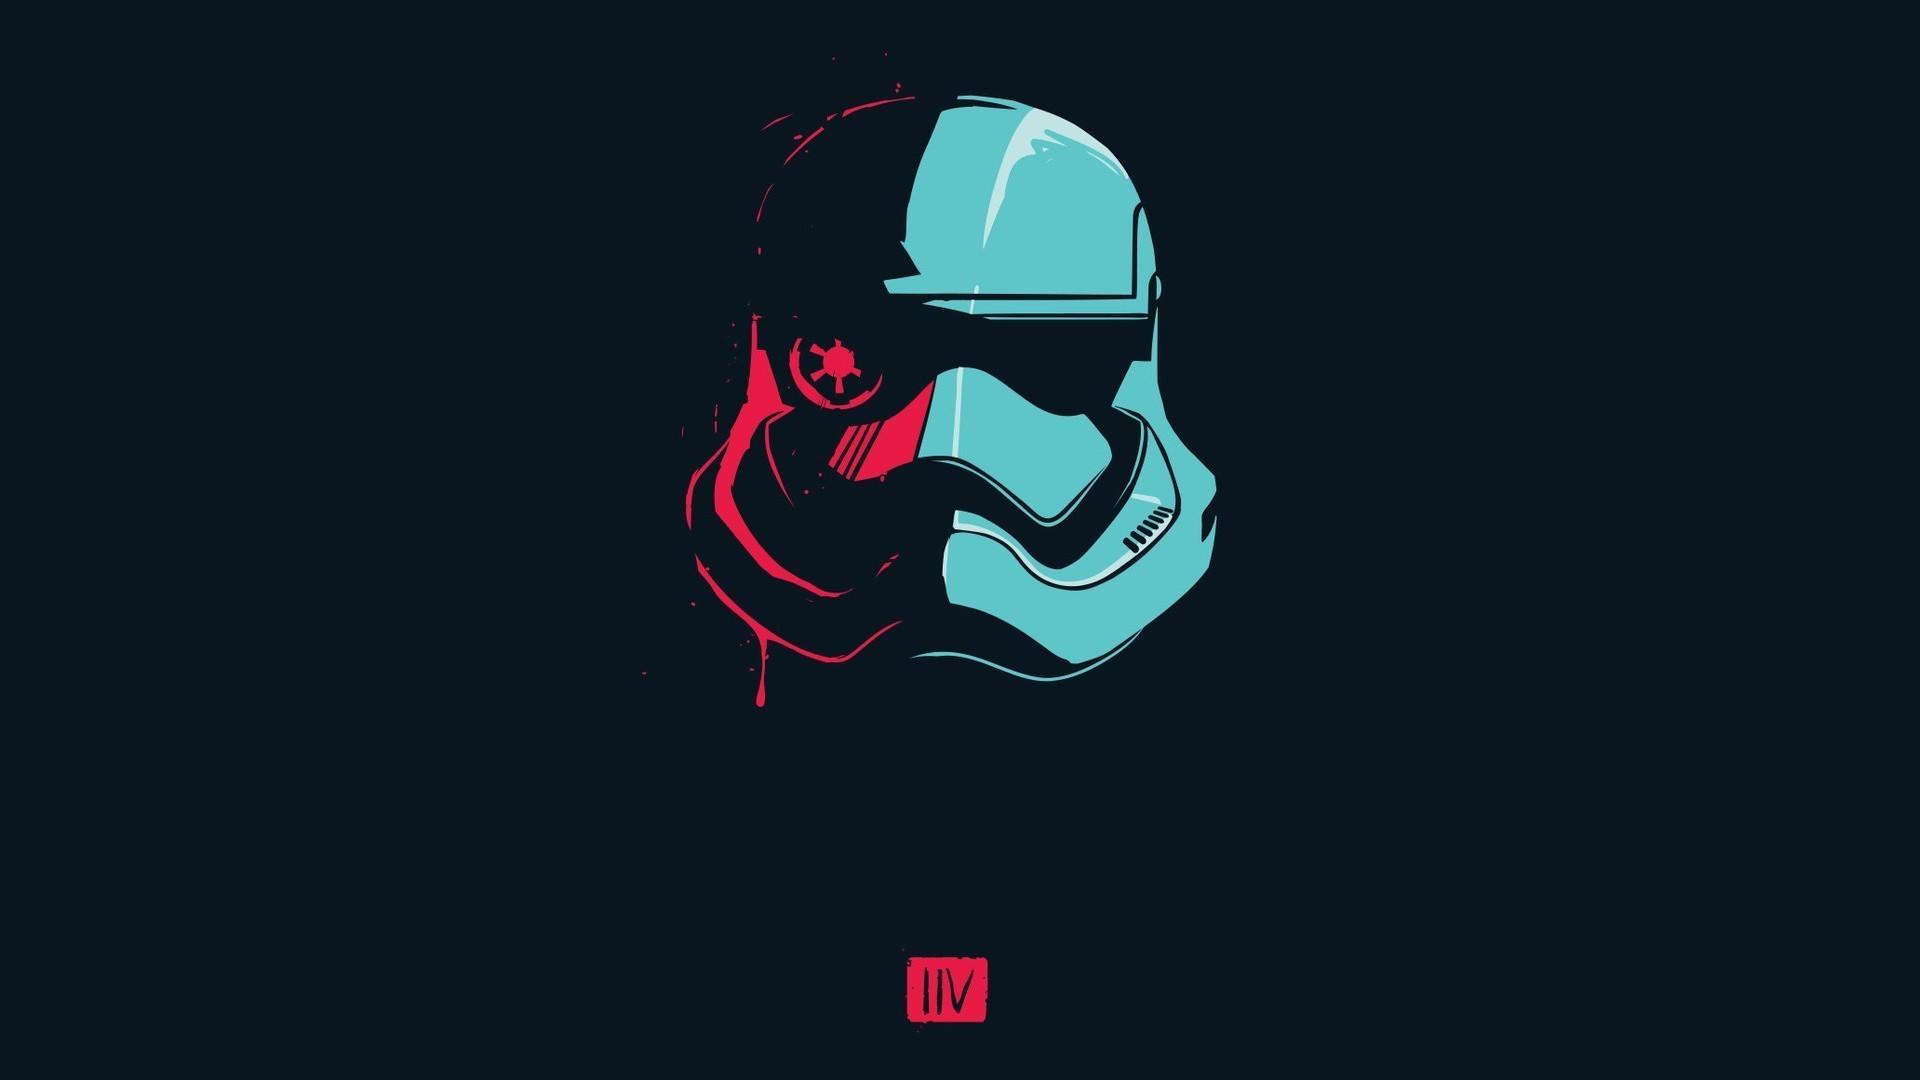 Kylo Ren Wallpaper Iphone X First Order Stormtrooper Wallpaper 183 ① Download Free